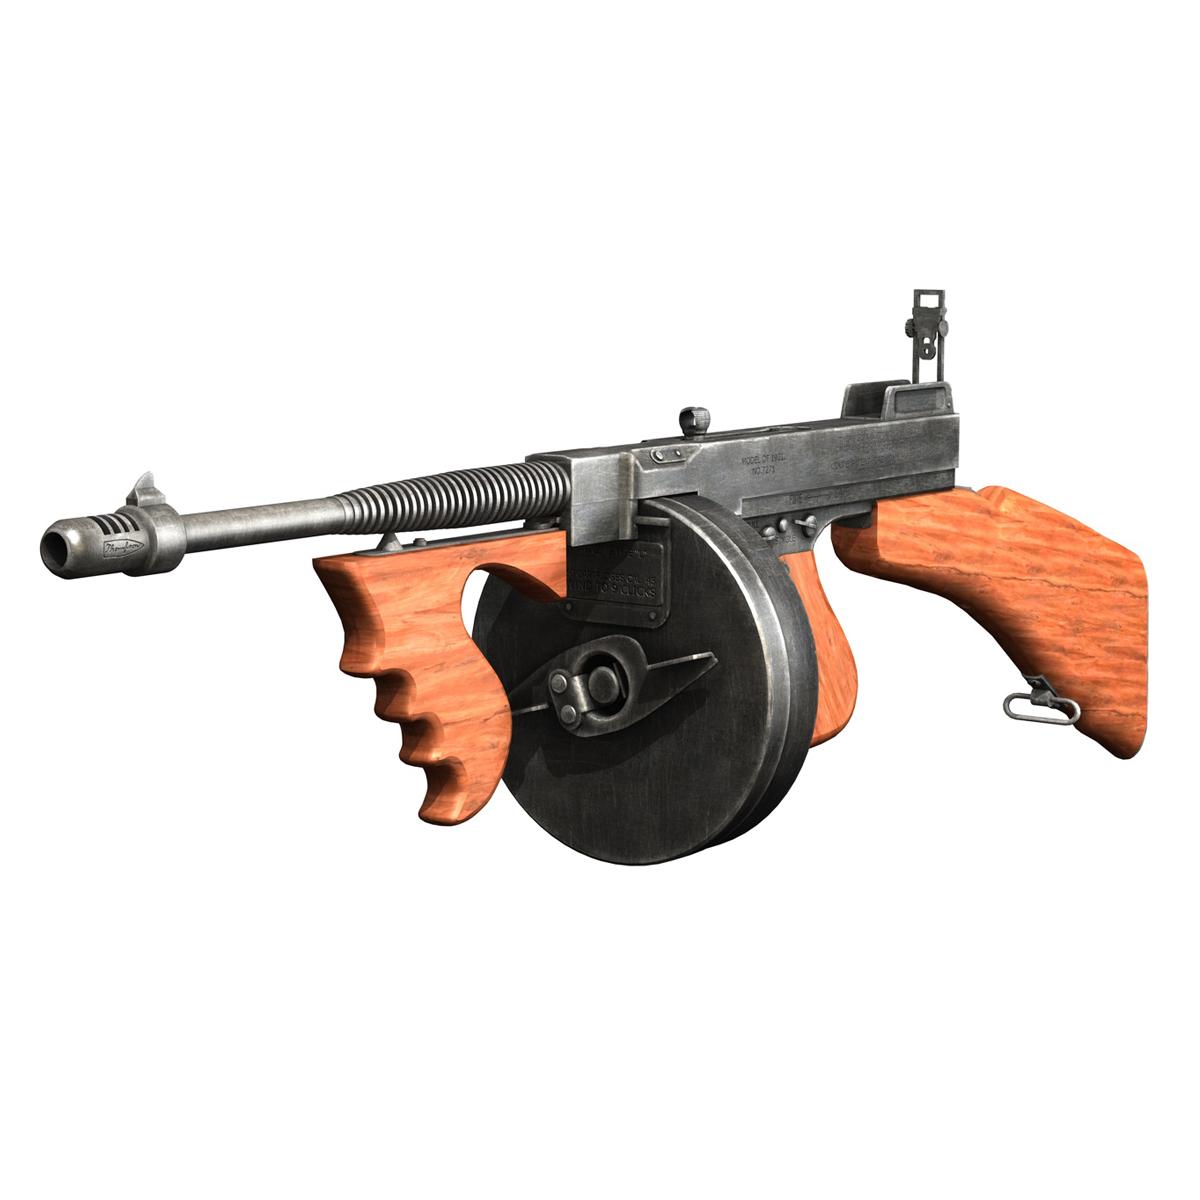 colt model1921 thompson submachine gun 3d model 3ds c4d lwo obj 264703